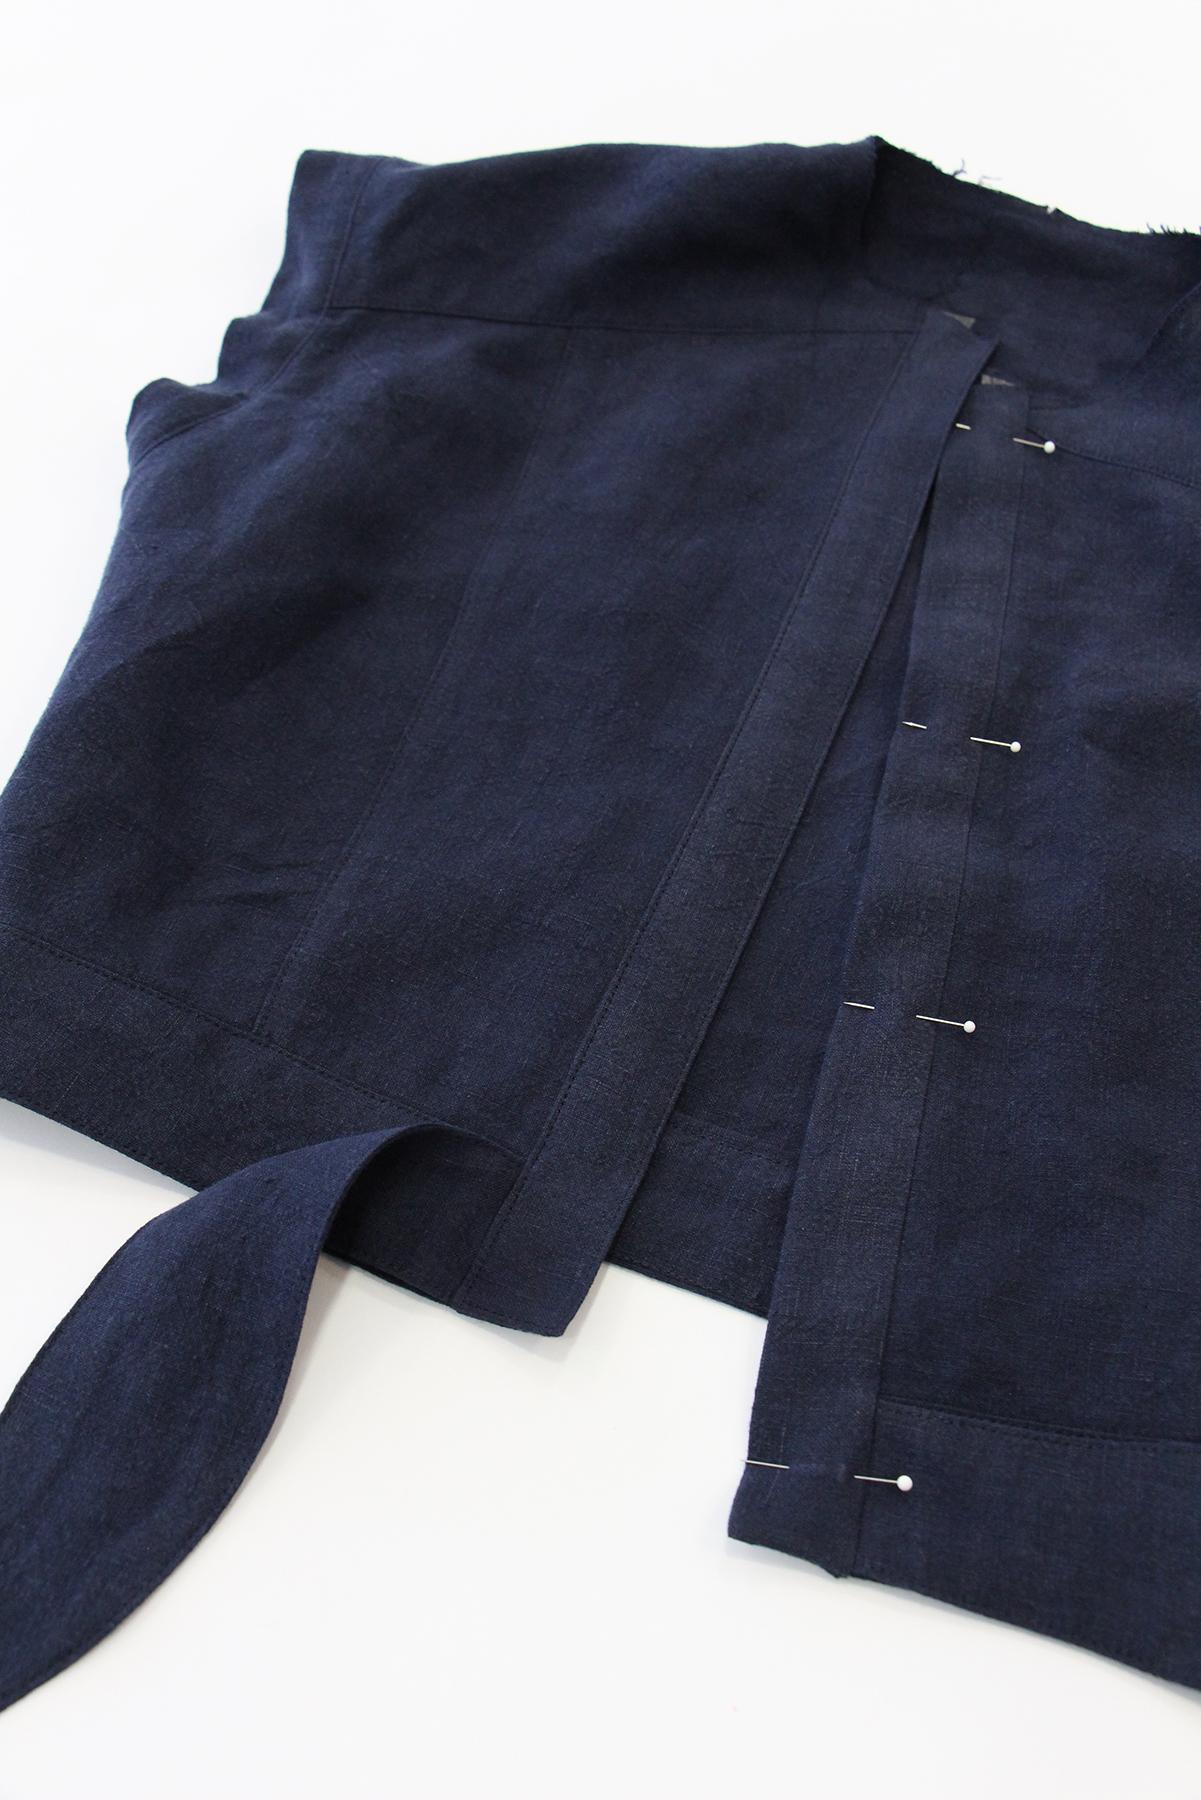 Megan Nielsen Patterns   Matilda Sewalong: Matching Set Hack   Folding Out & Top Stitching Your Top Placket